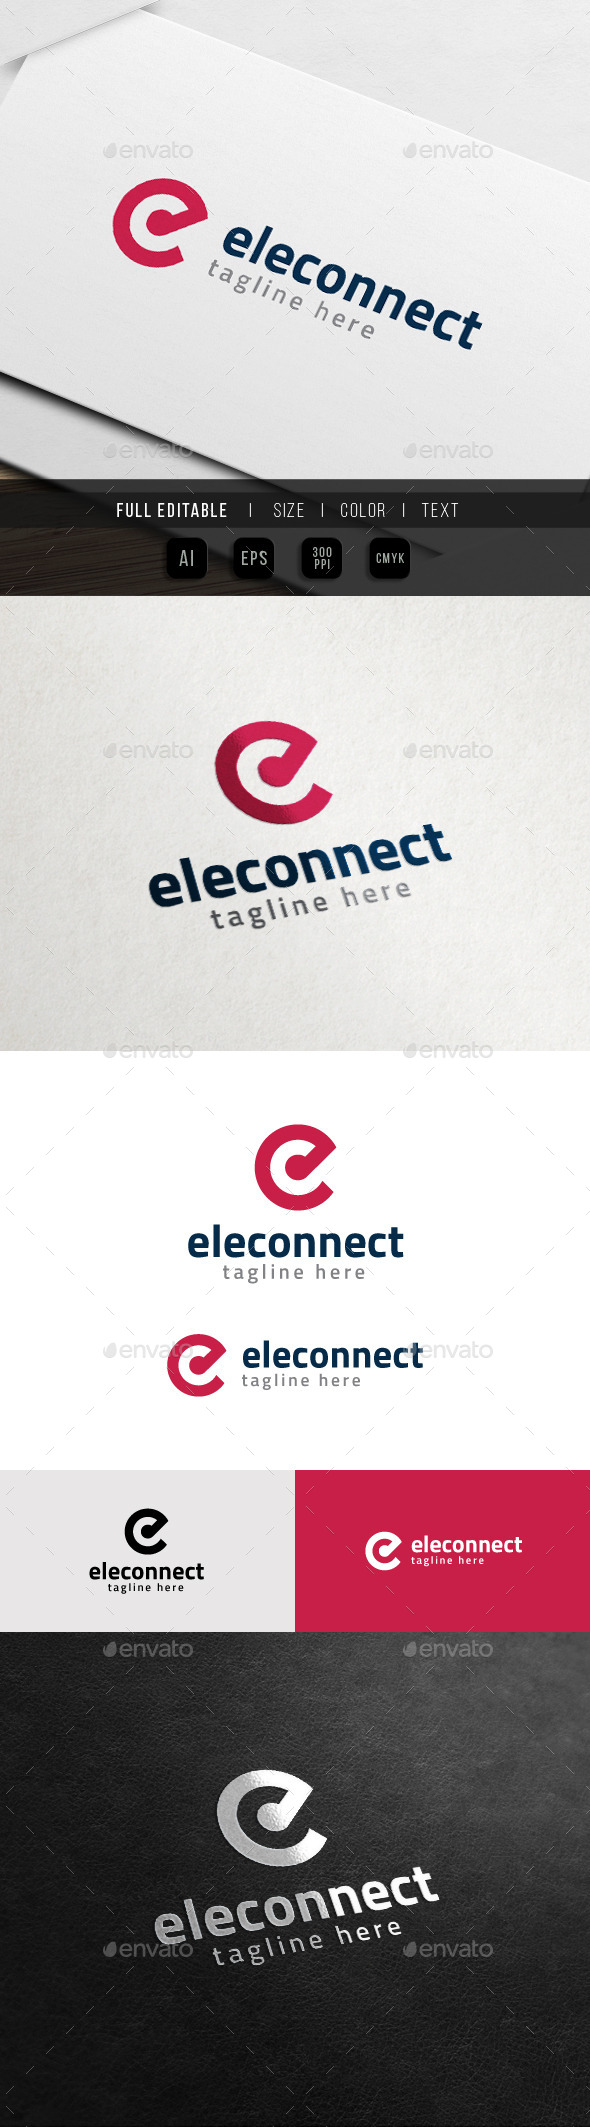 Elegant Brand - Fashion Apparel - E Logo